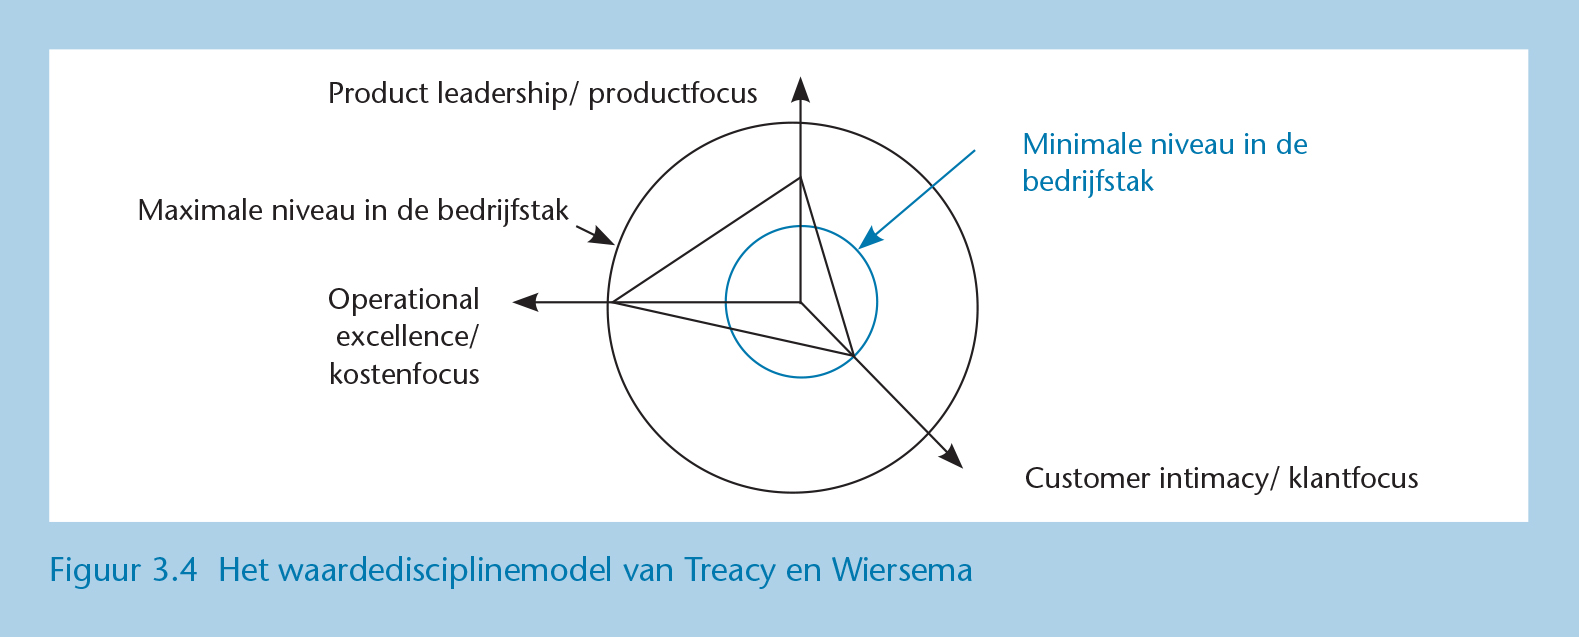 Marketingmodellen waardestrategie